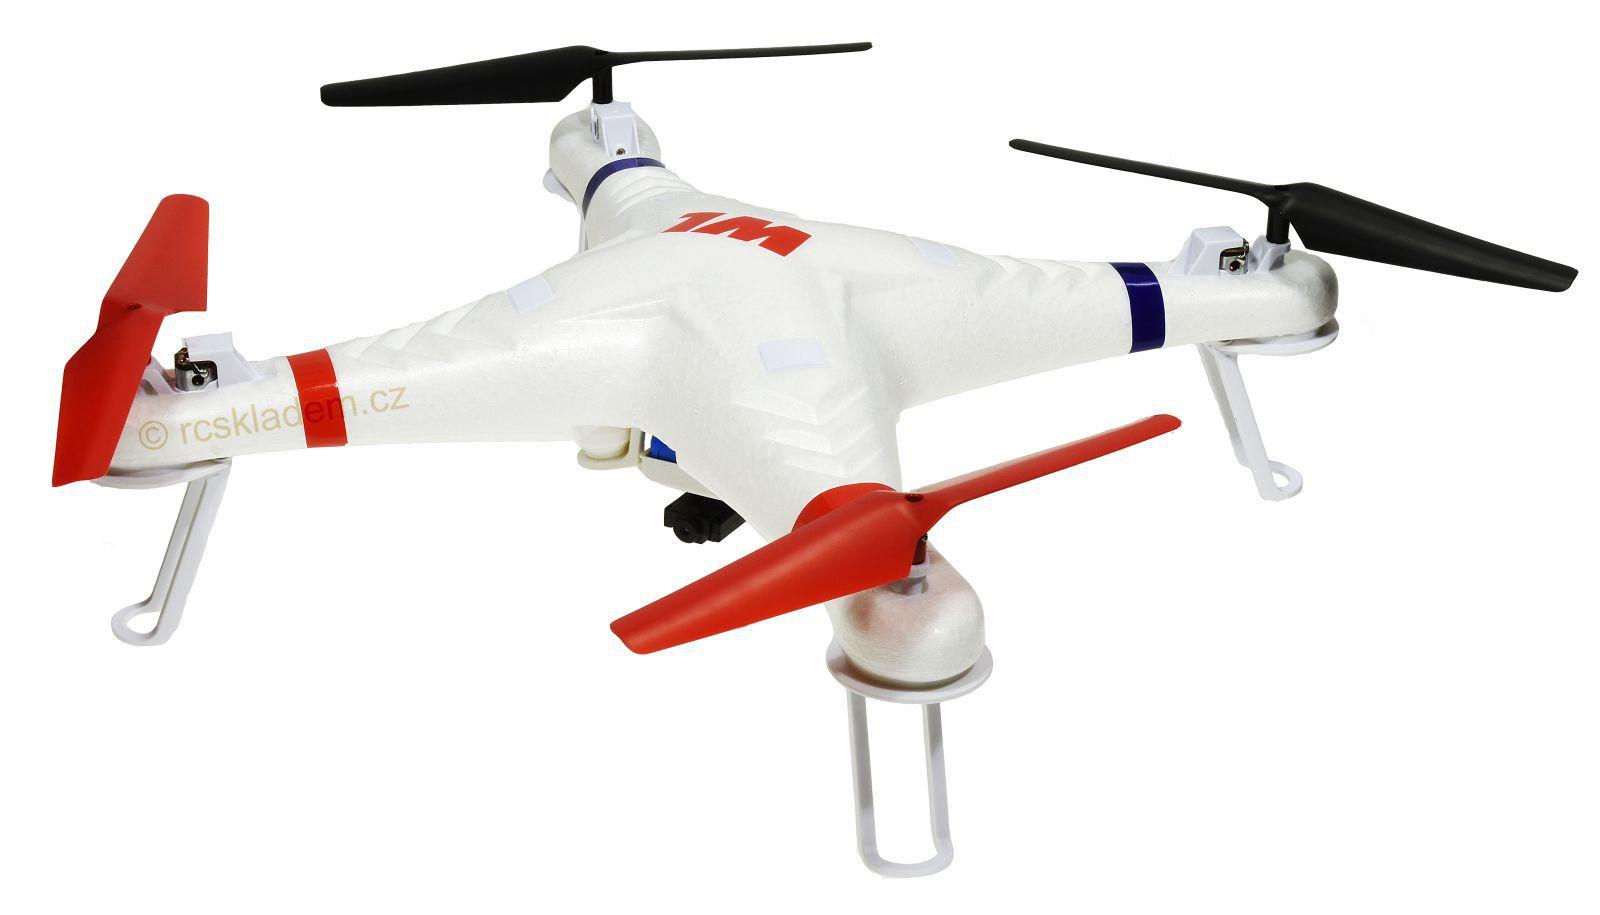 GALAXY V353 s kamerou WL Toys